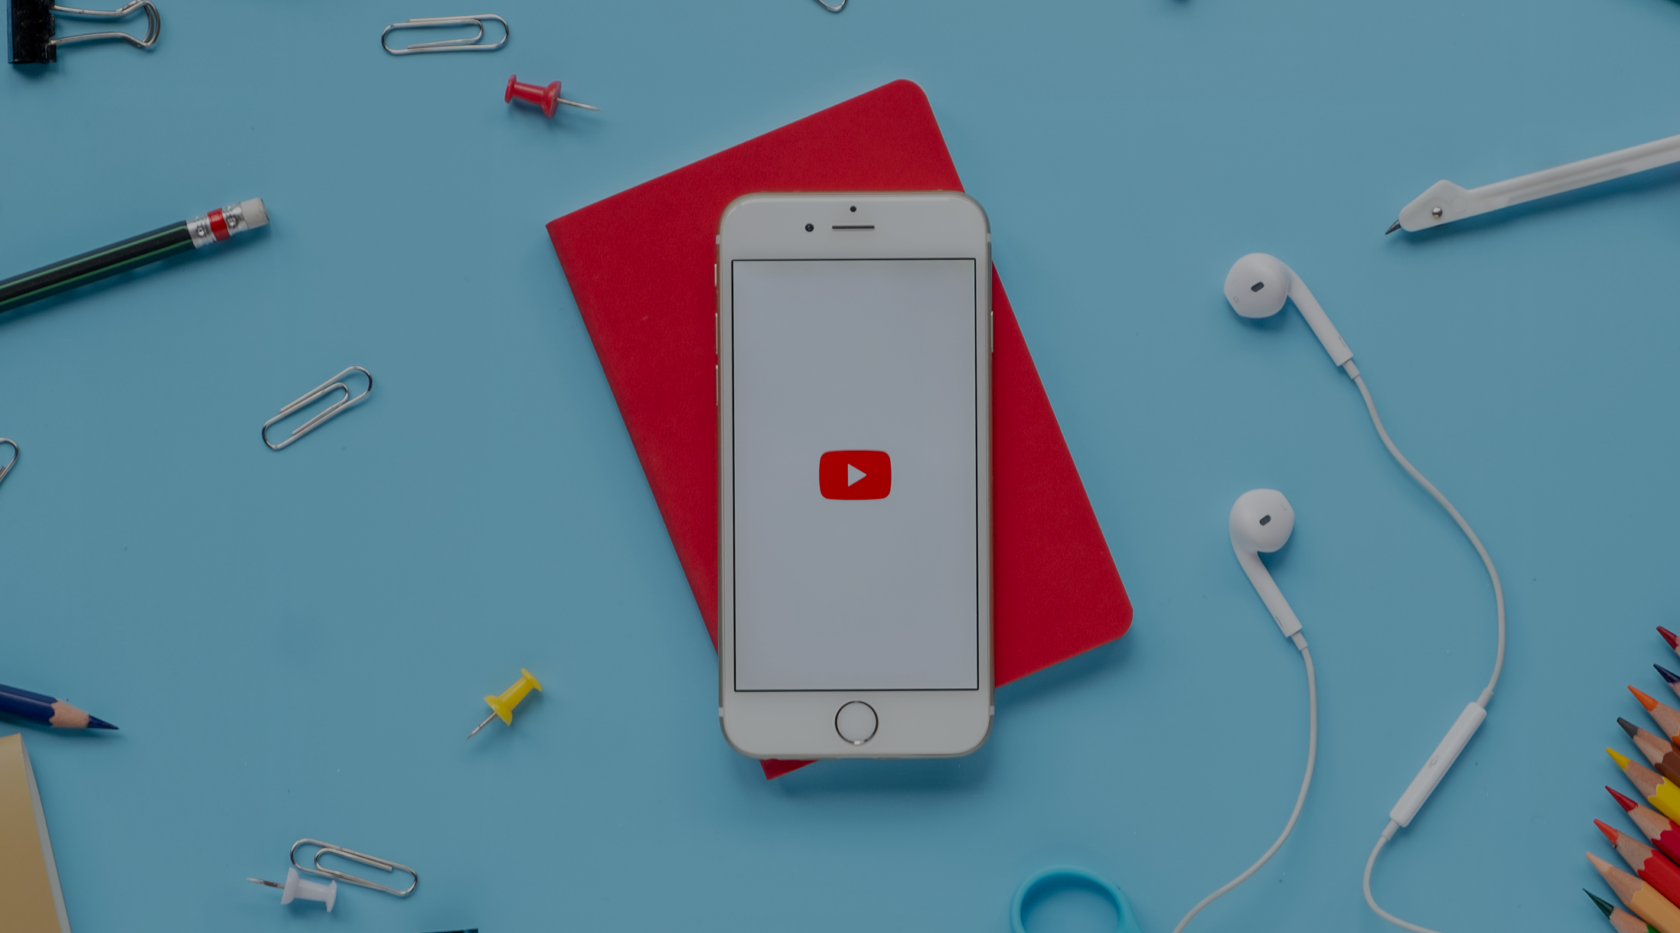 marketing-video-blog-lapinoalbino-production-video